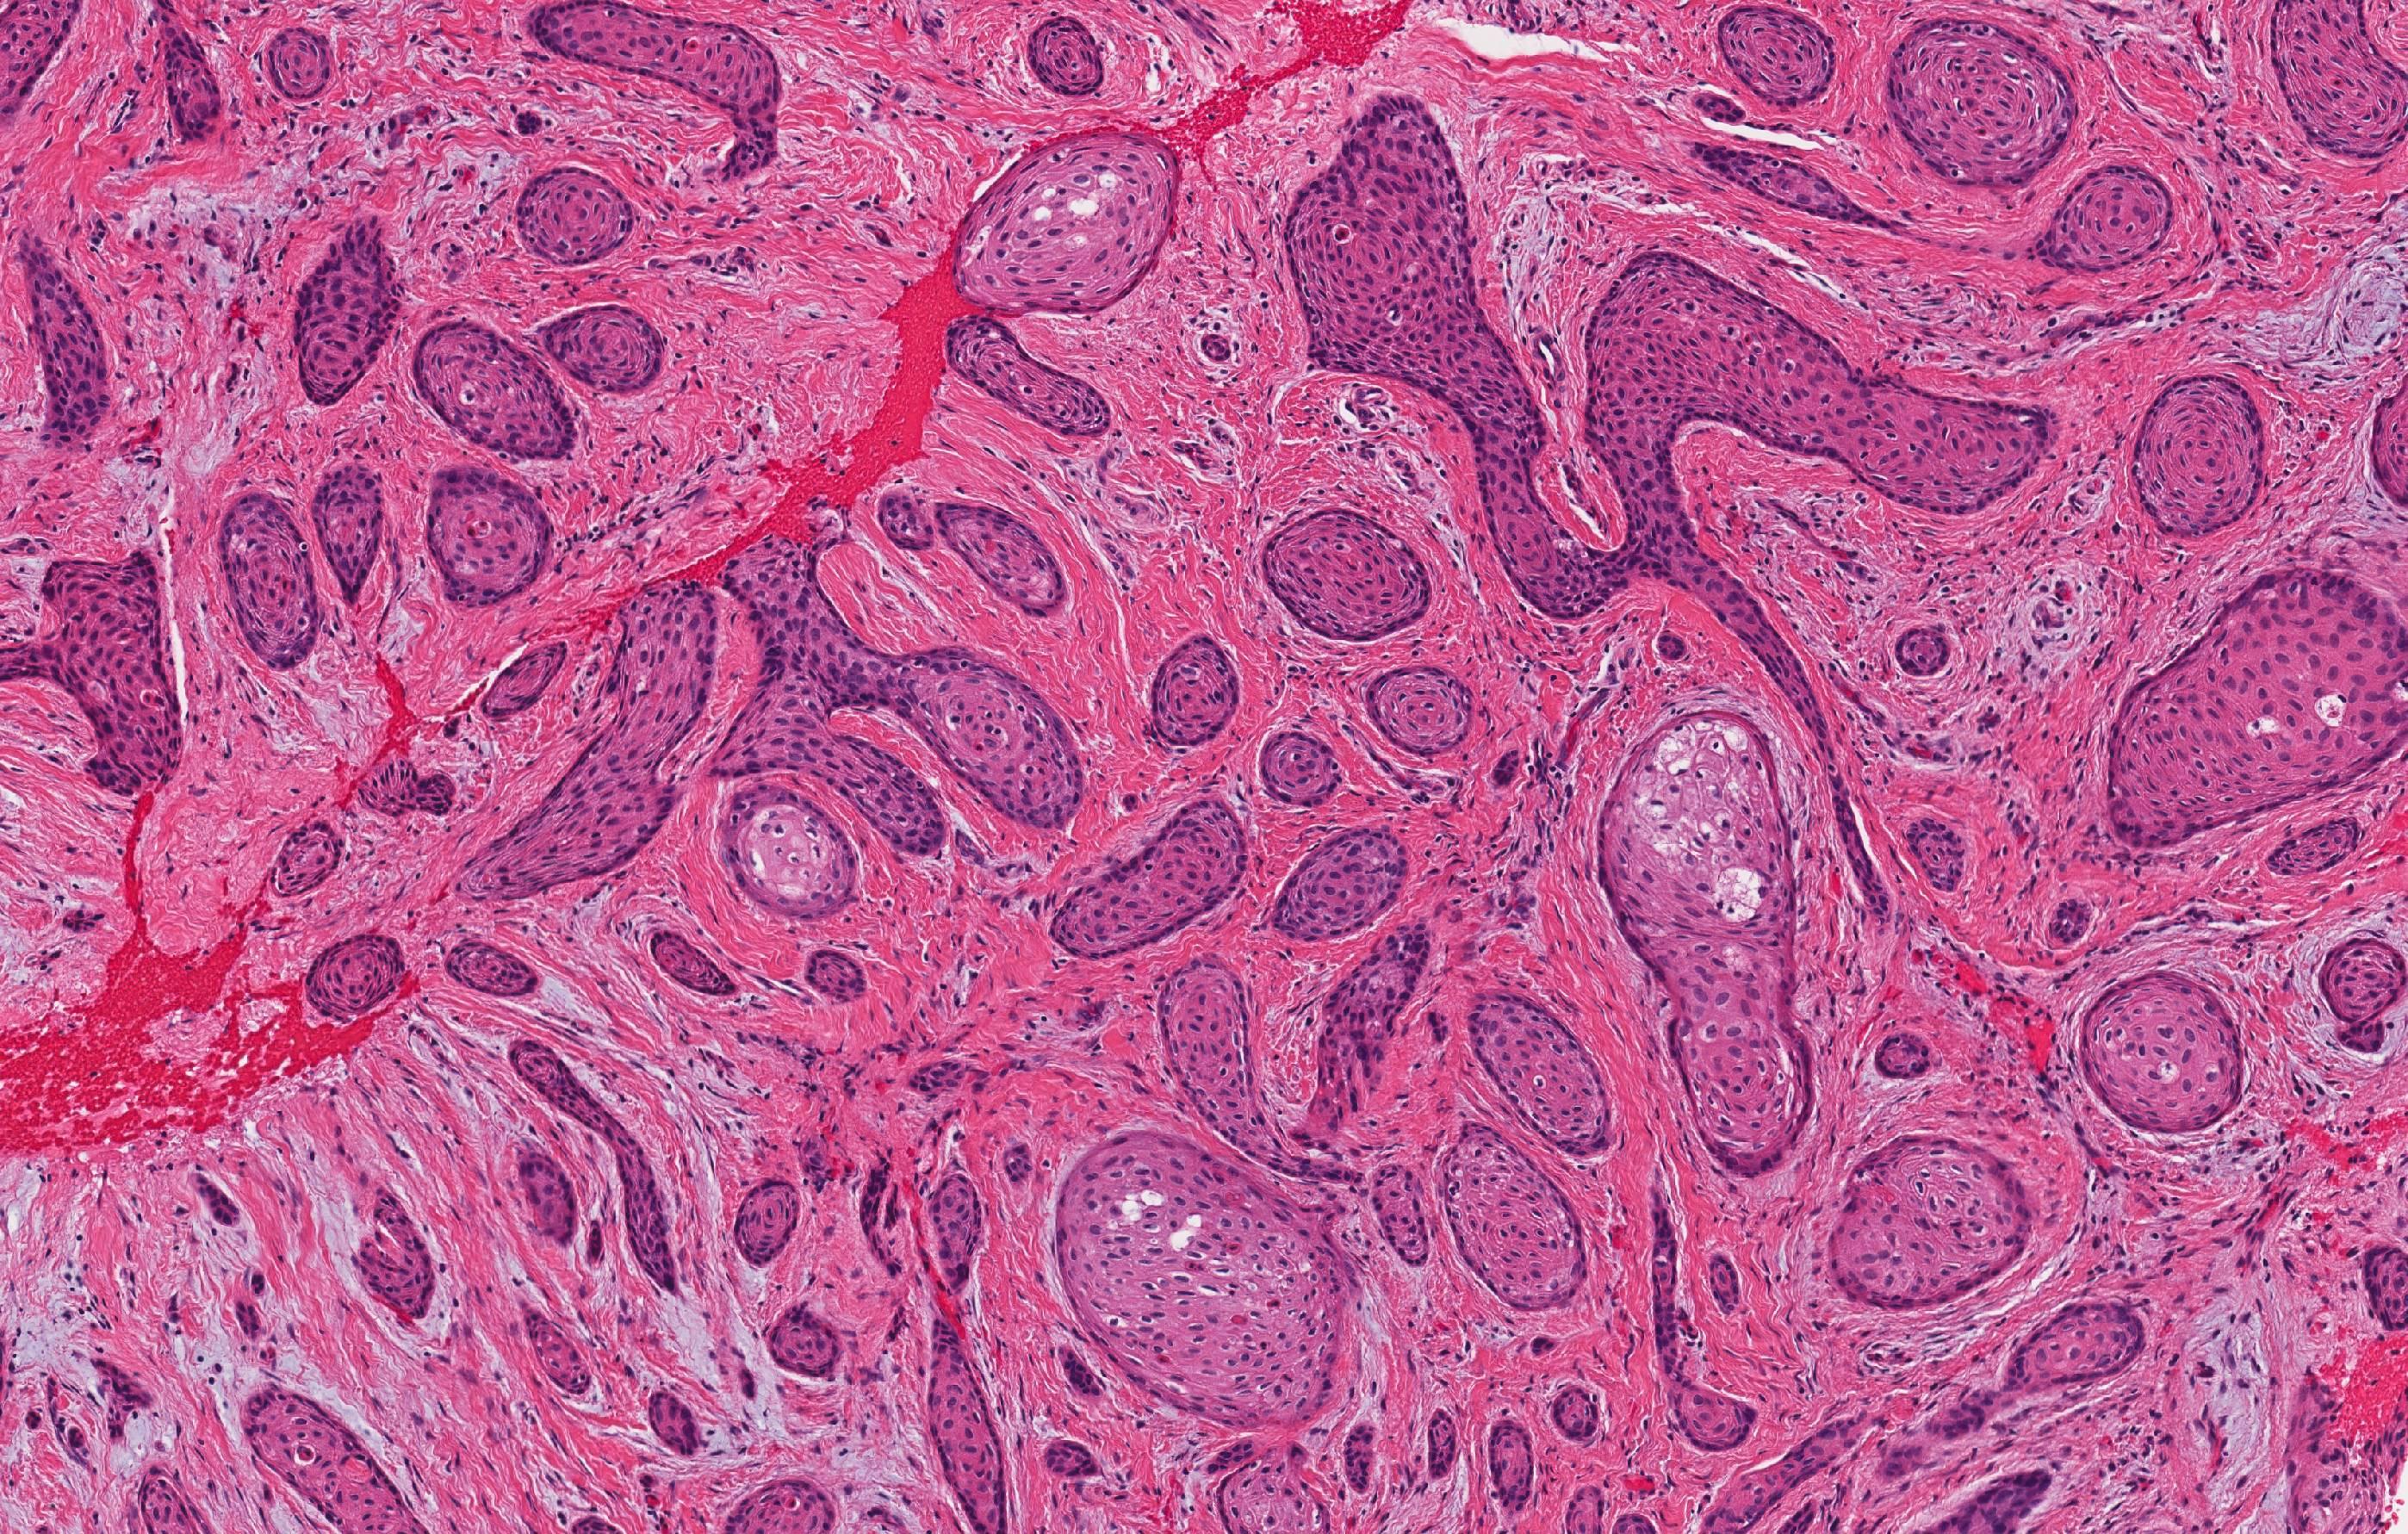 Squamous odontogenic tumor